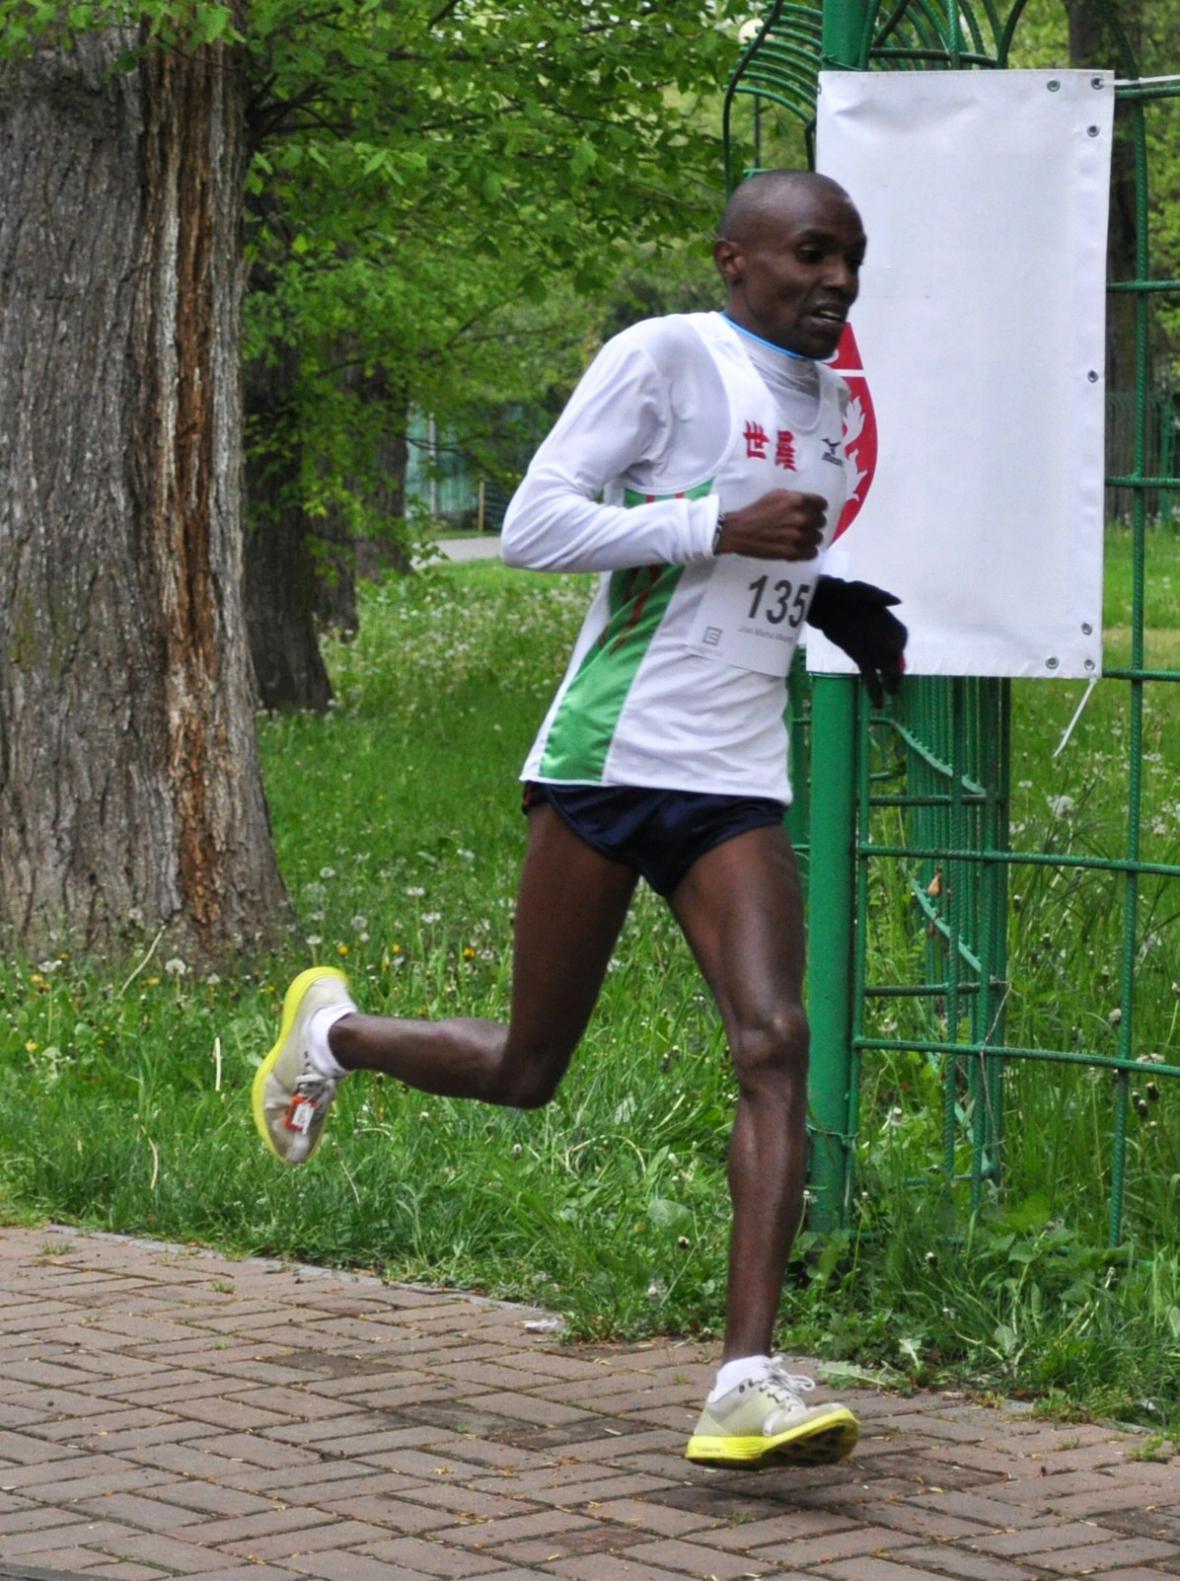 Joel Marina Mwangi